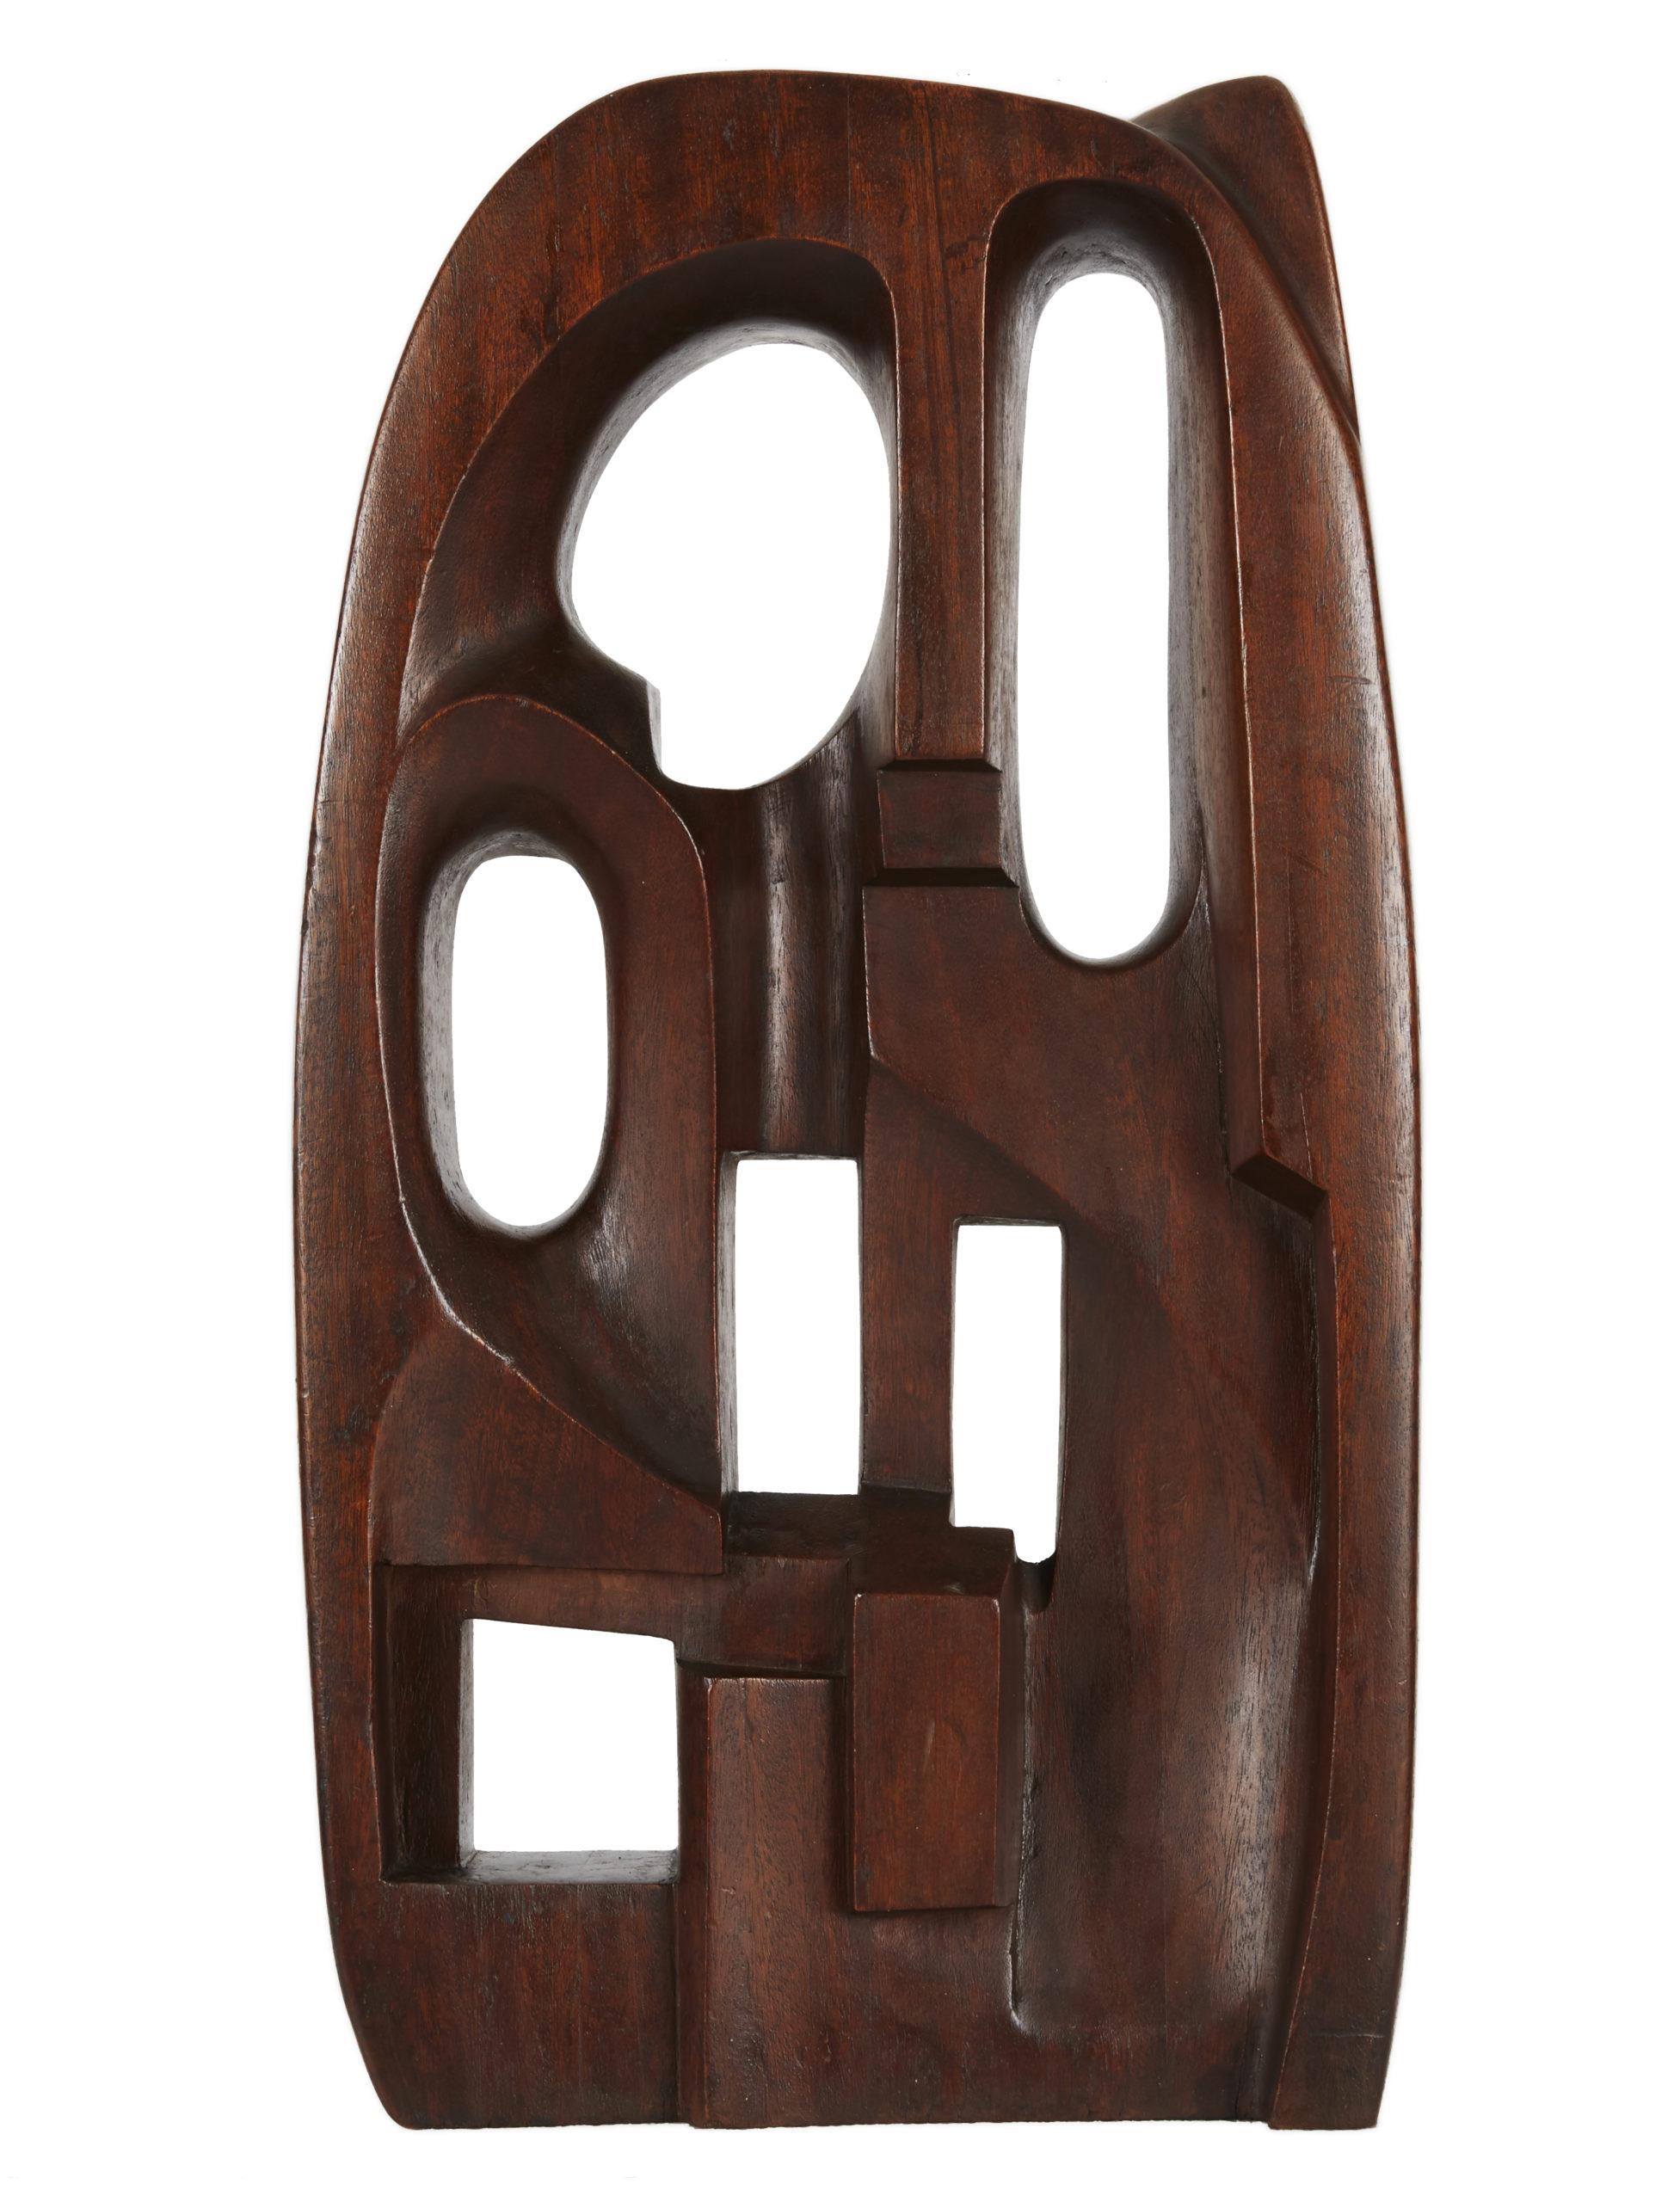 Saloua Raouda Choucair, Interform, 1960, Wood, 60 × 32 × 11.5 cm. Image courtesy of Barjeel Art Foundation, Sharjah.